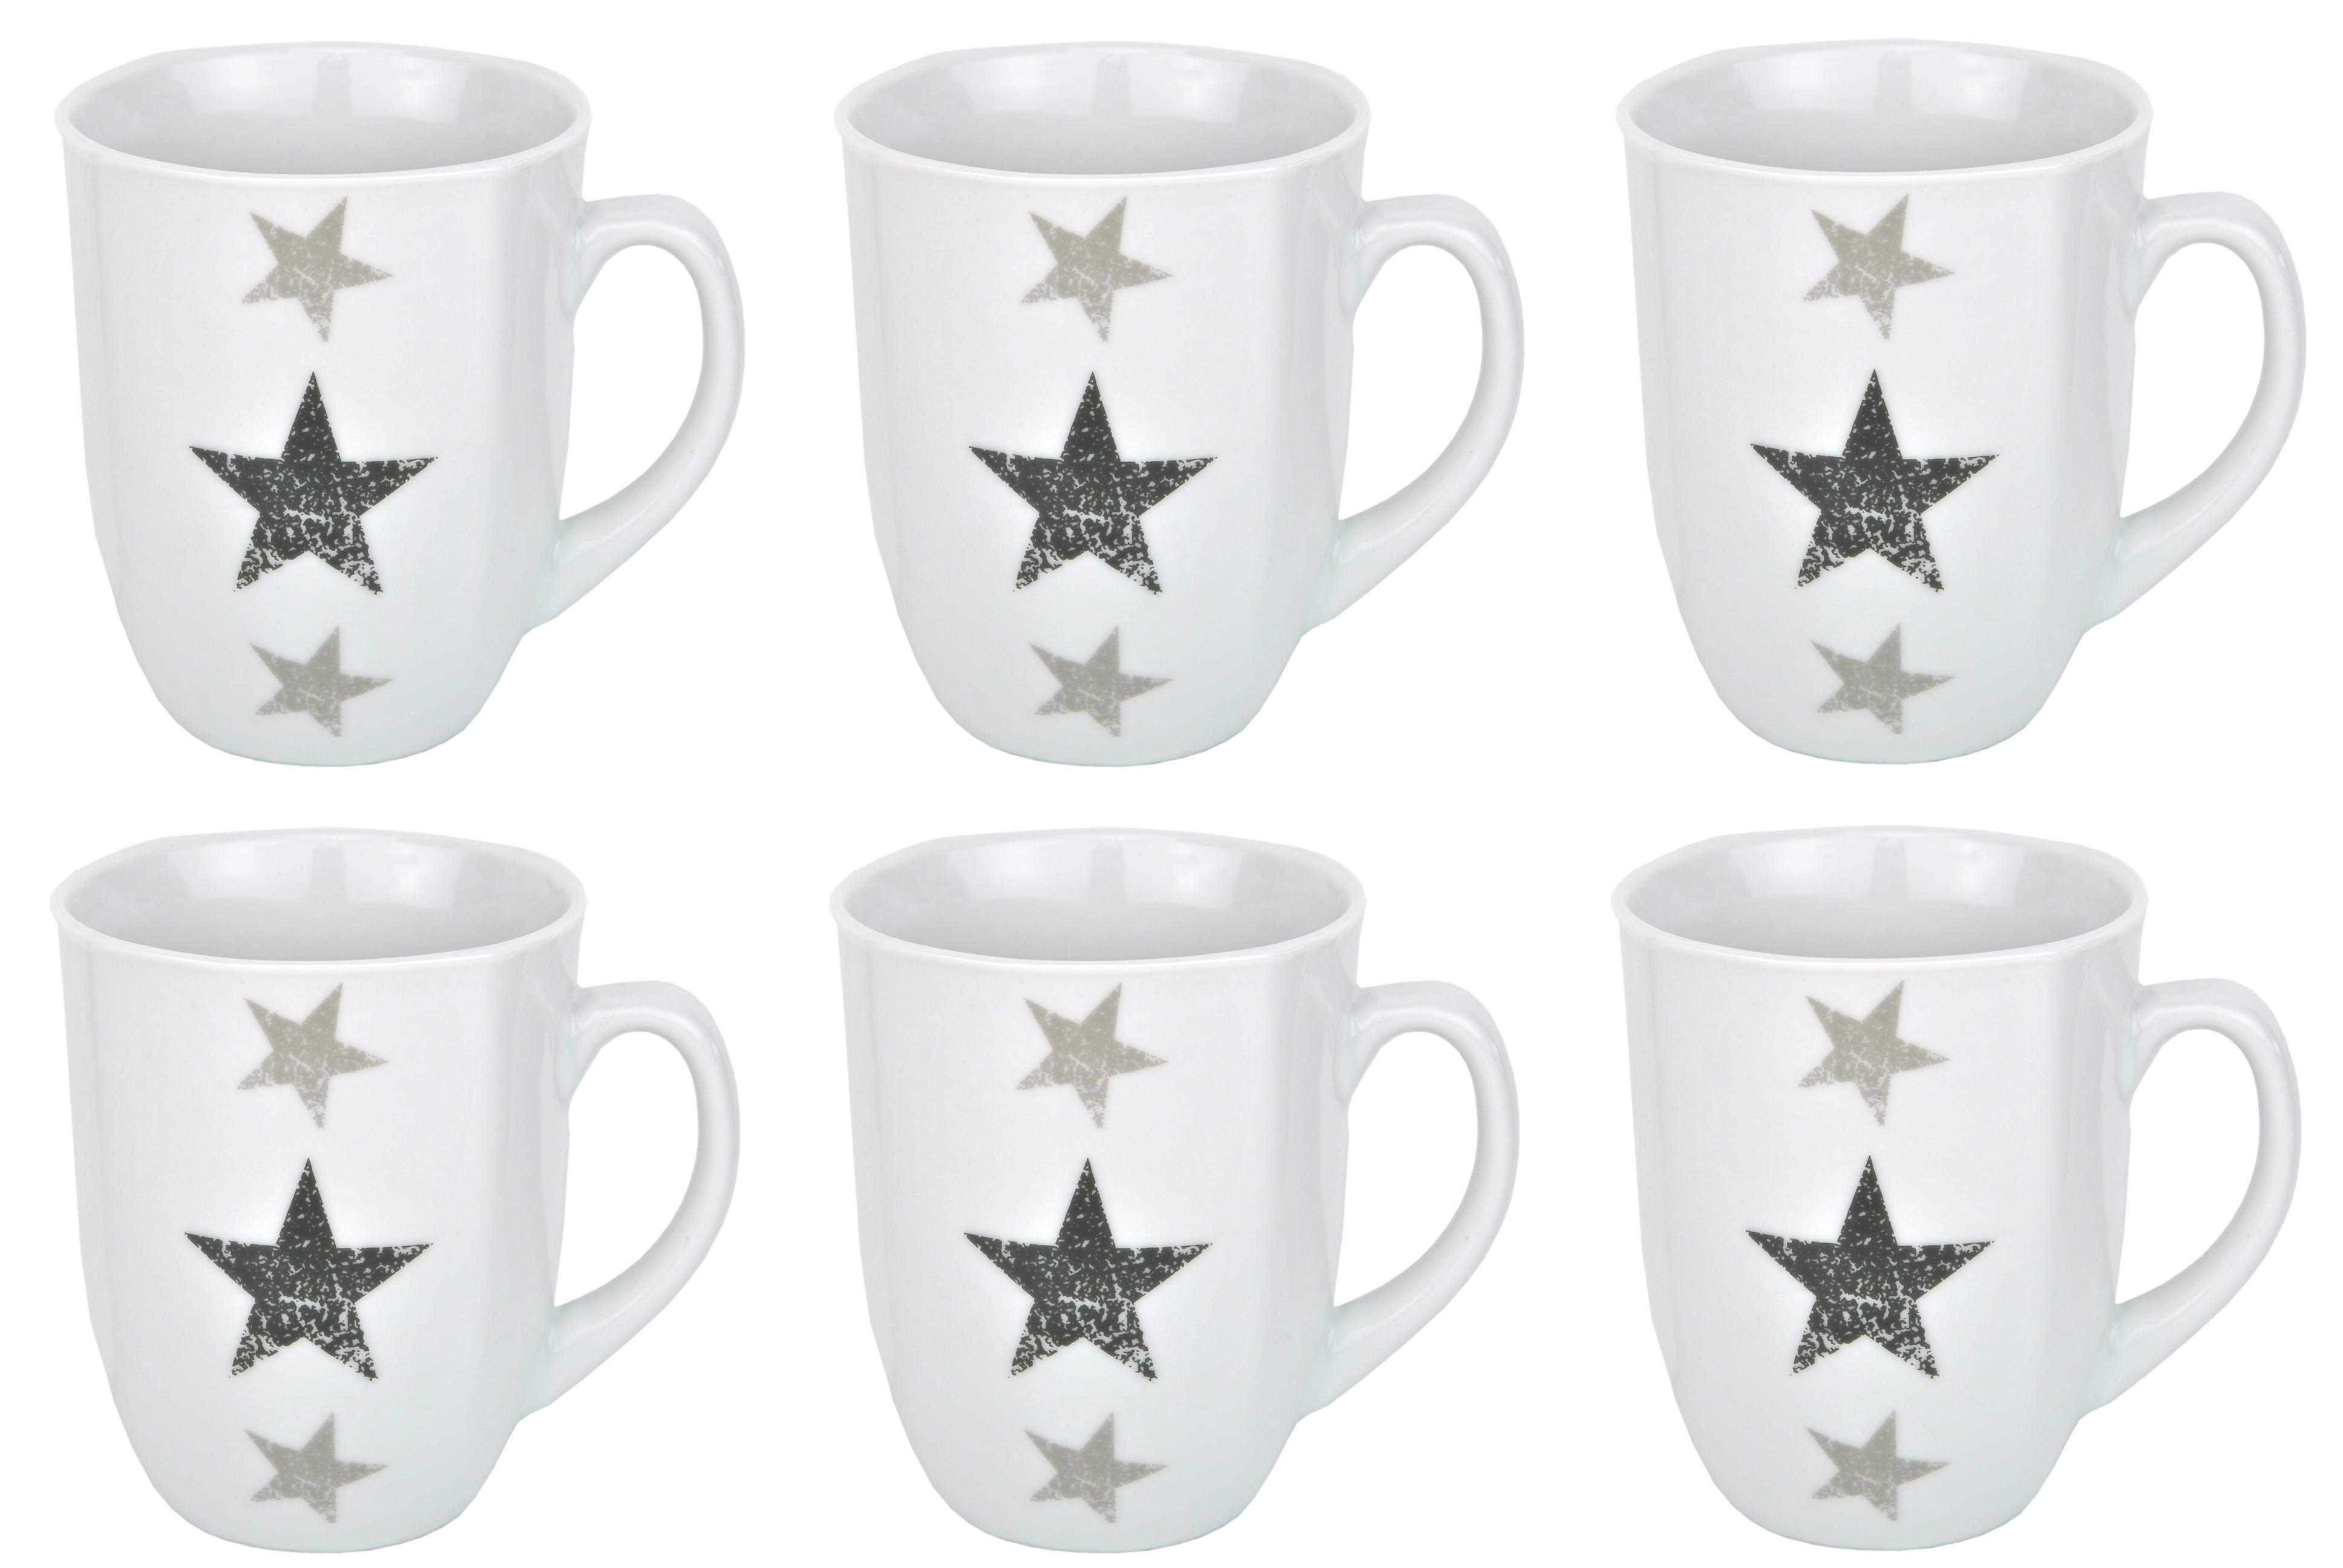 6er set kaffeebecher stars 33cl porzellan tassen und becher. Black Bedroom Furniture Sets. Home Design Ideas